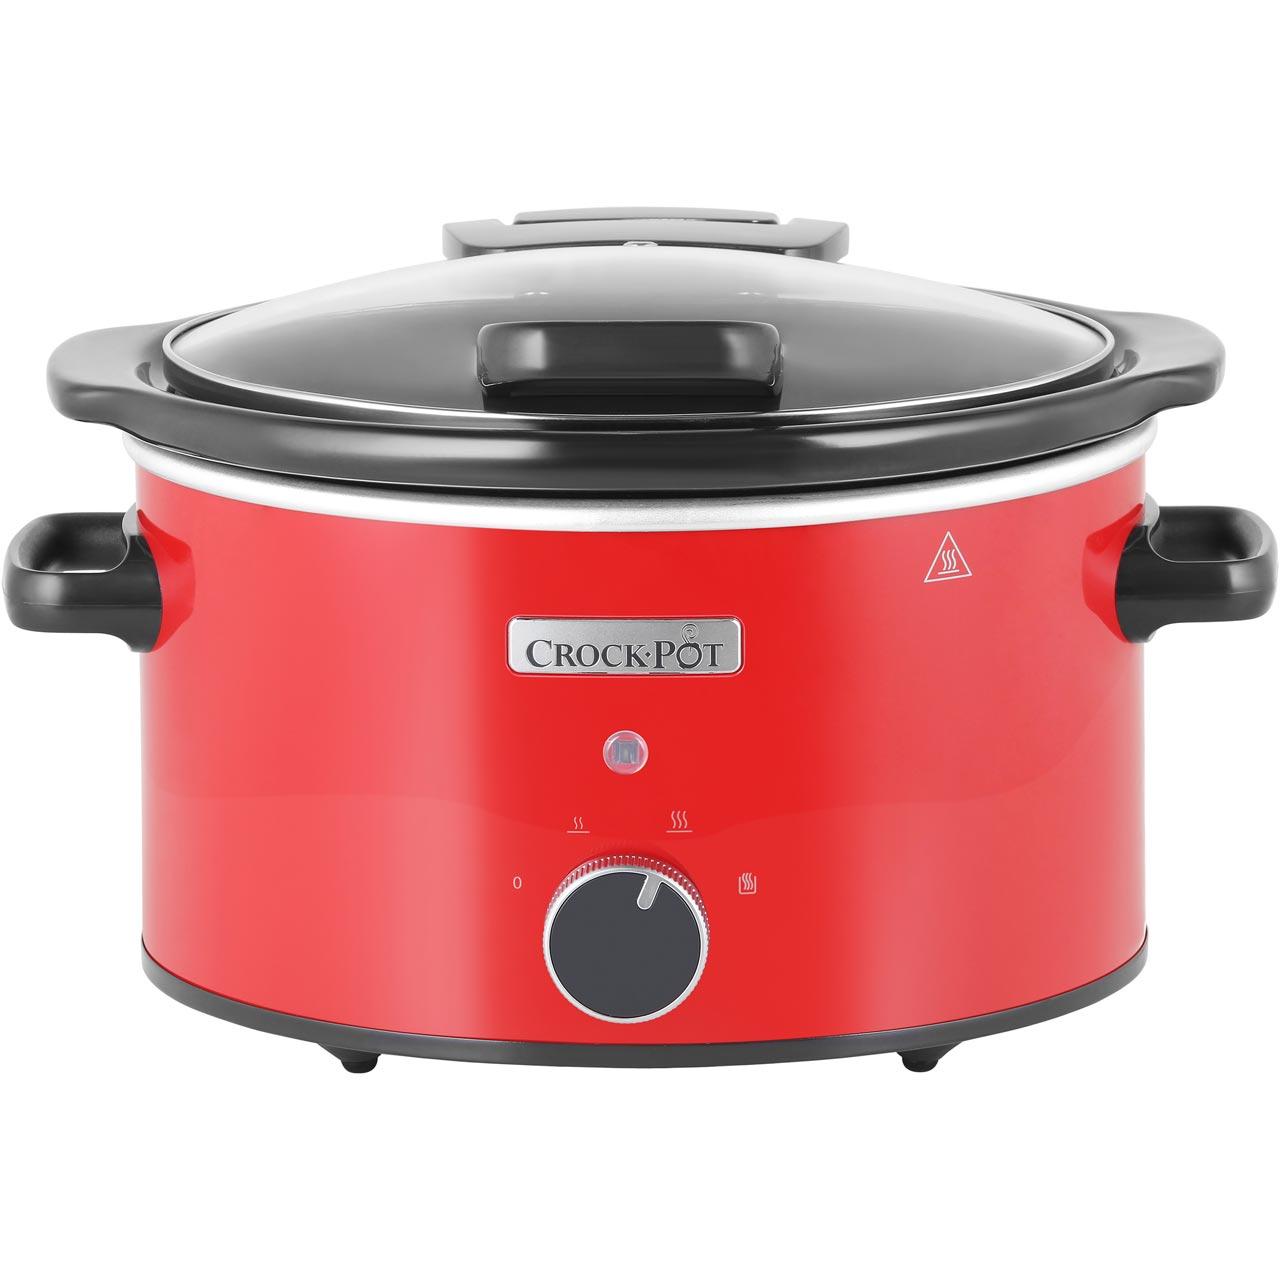 Crock Pot CSC037 Slow Cooker